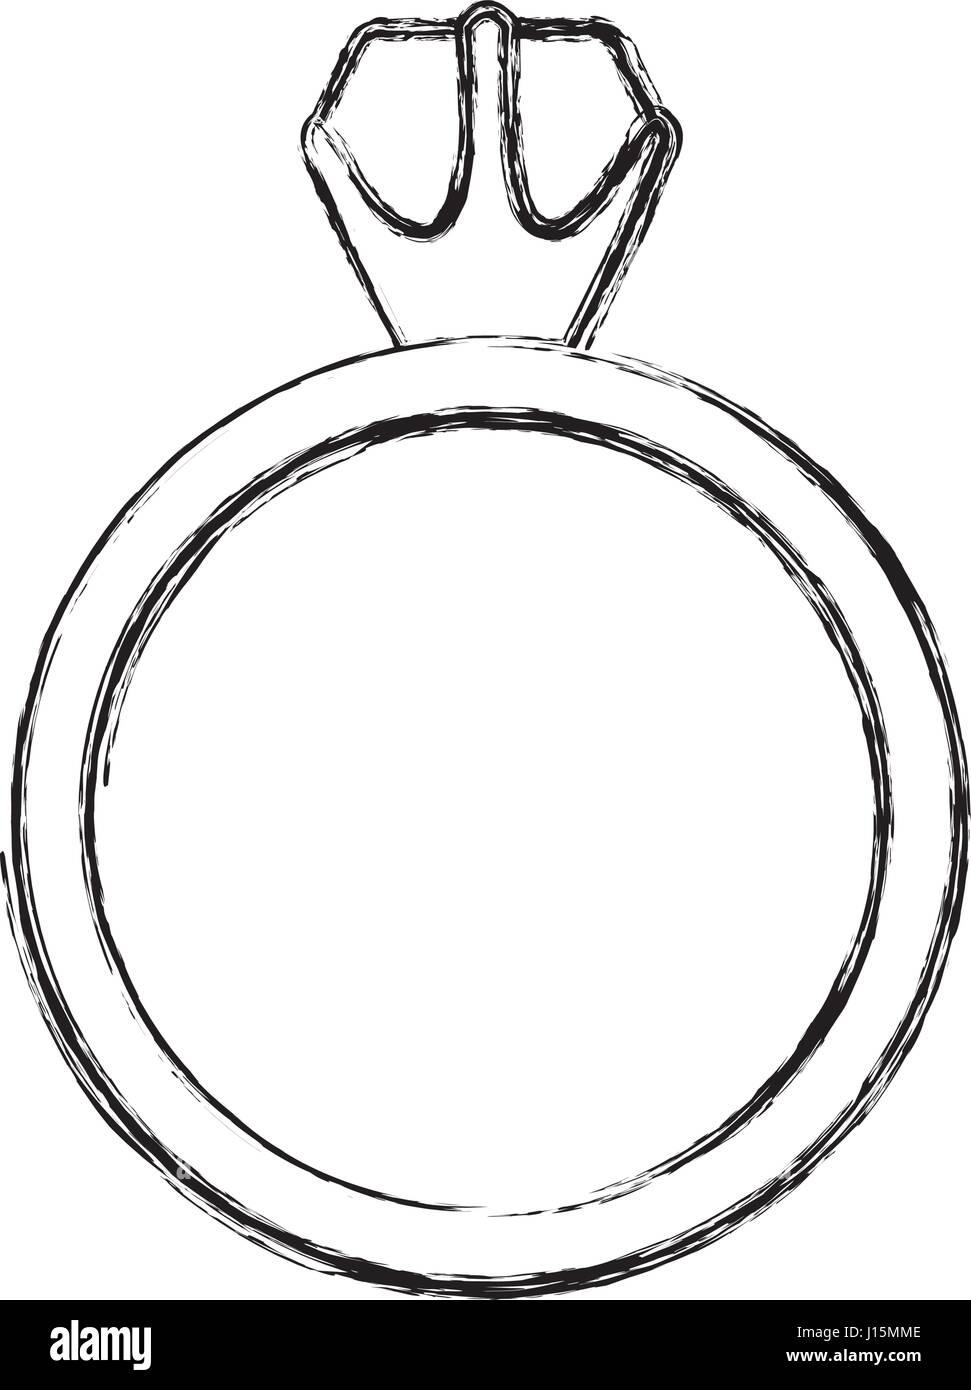 monochrome sketch contour of diamond ring - Stock Image